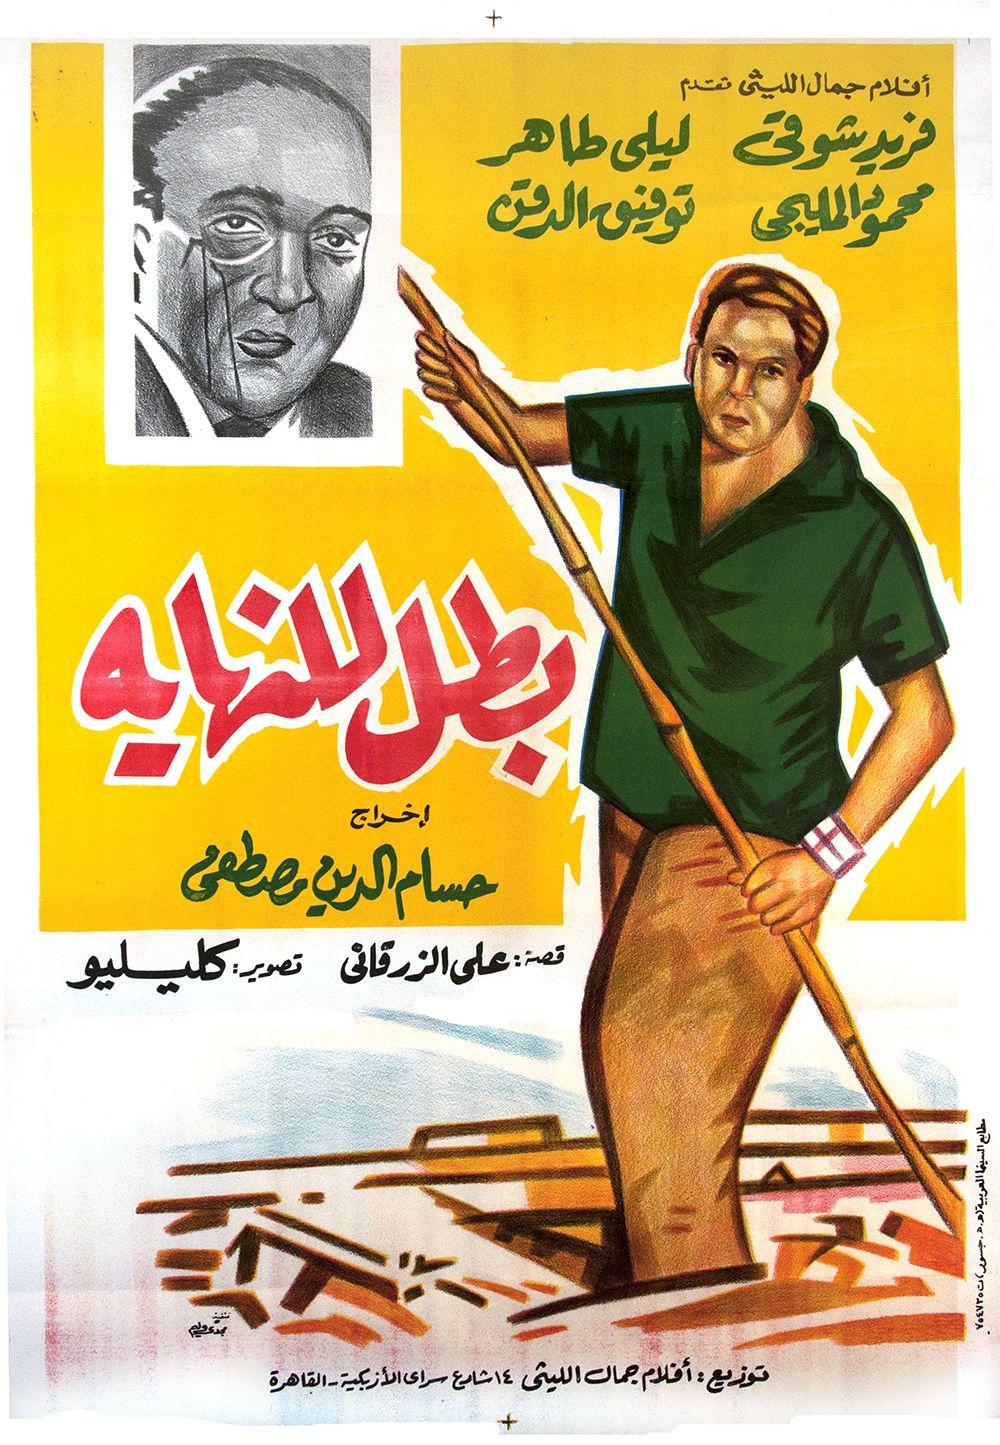 A Year of Spy Films 32/365 Batal lil nehaya (بطل للنهايه) aka Hero Until the End (1963 Egypt) The International Spy Film Guide Score: 8/10 #isfg #spyfilmguide #filmnoir #arabspy #egypt #spymovie